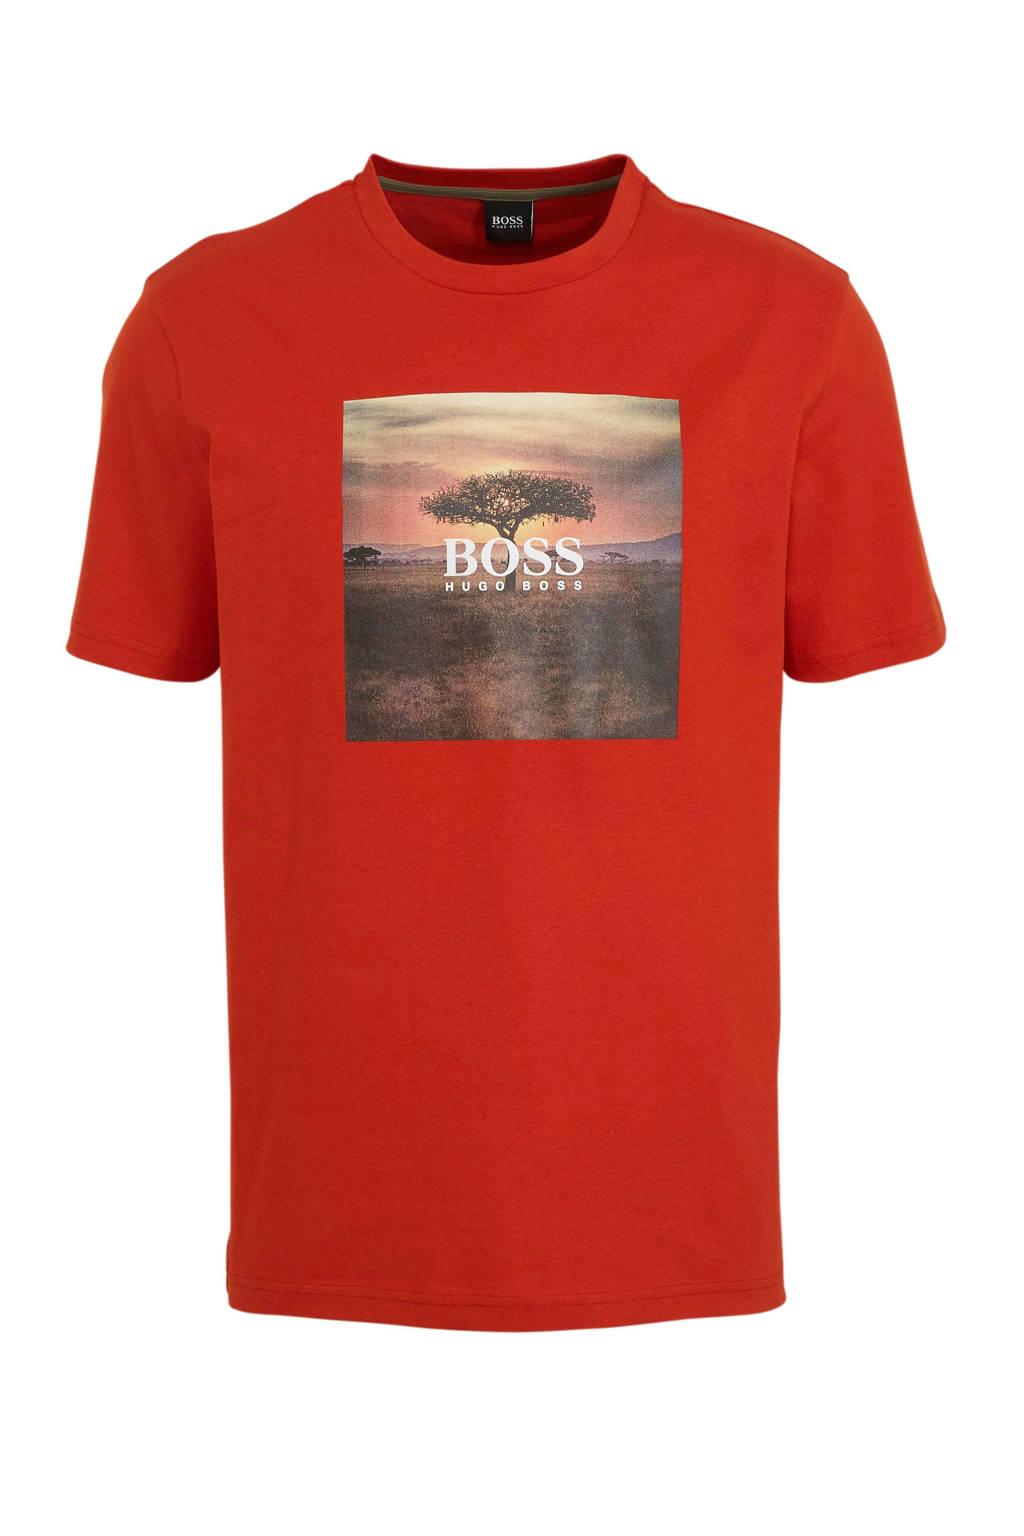 BOSS Casual T-shirt met printopdruk rood, Rood